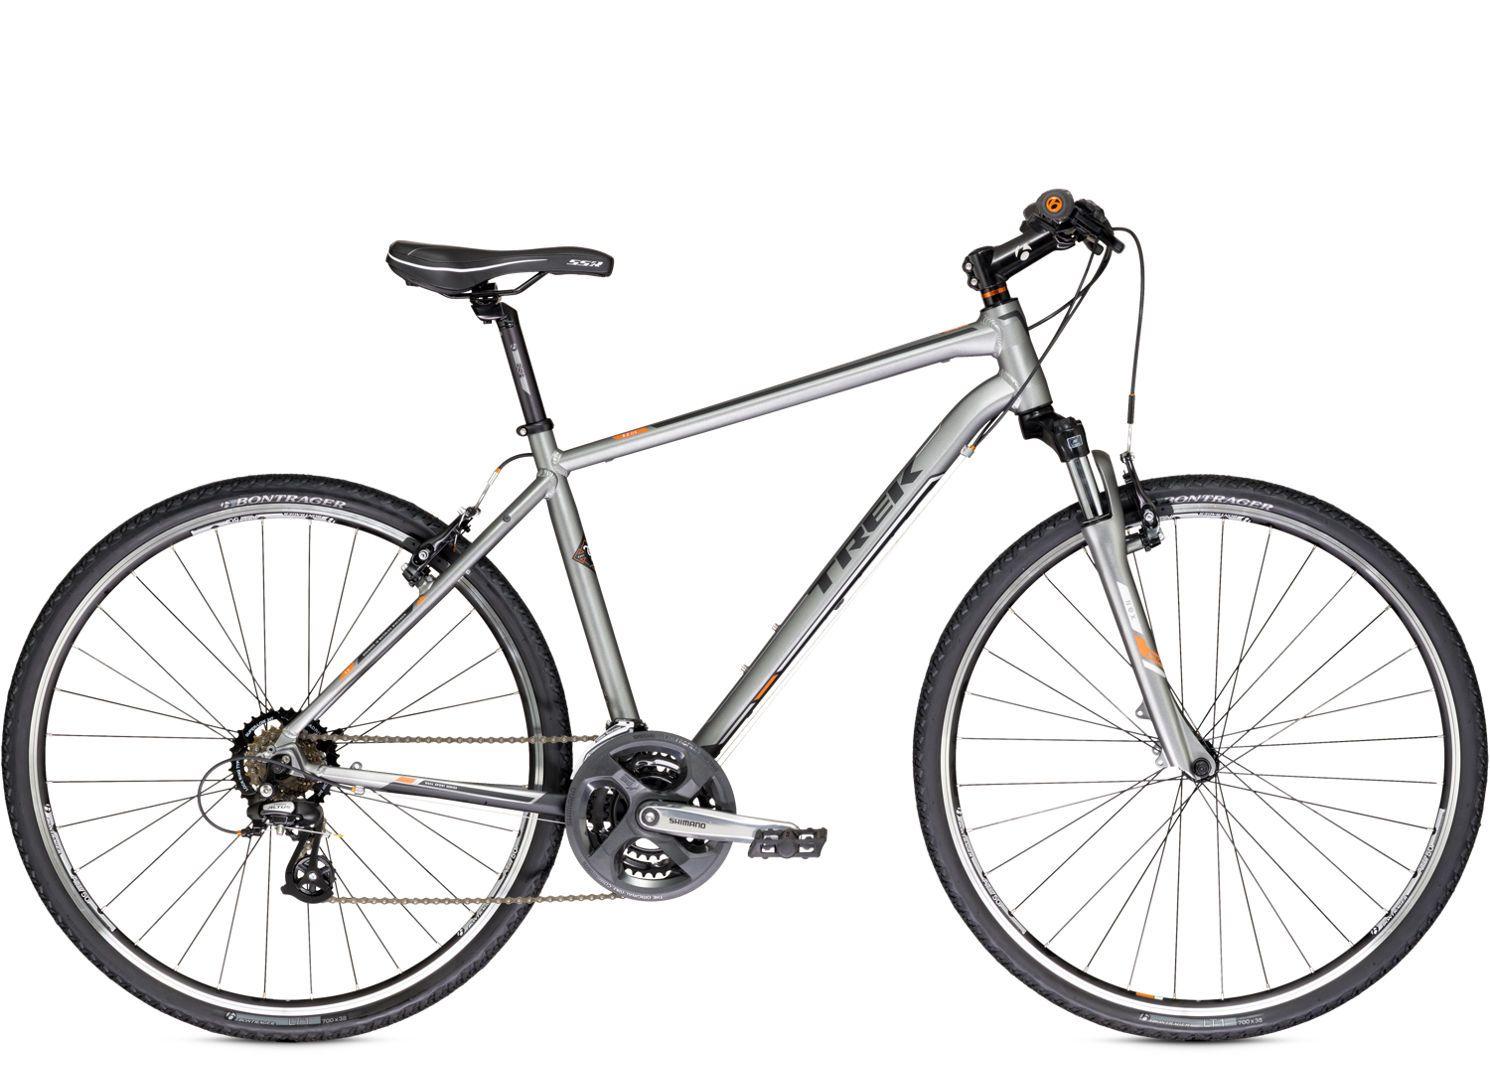 8.2 DS Trek Bicycle Trek bikes, Hybrid bike